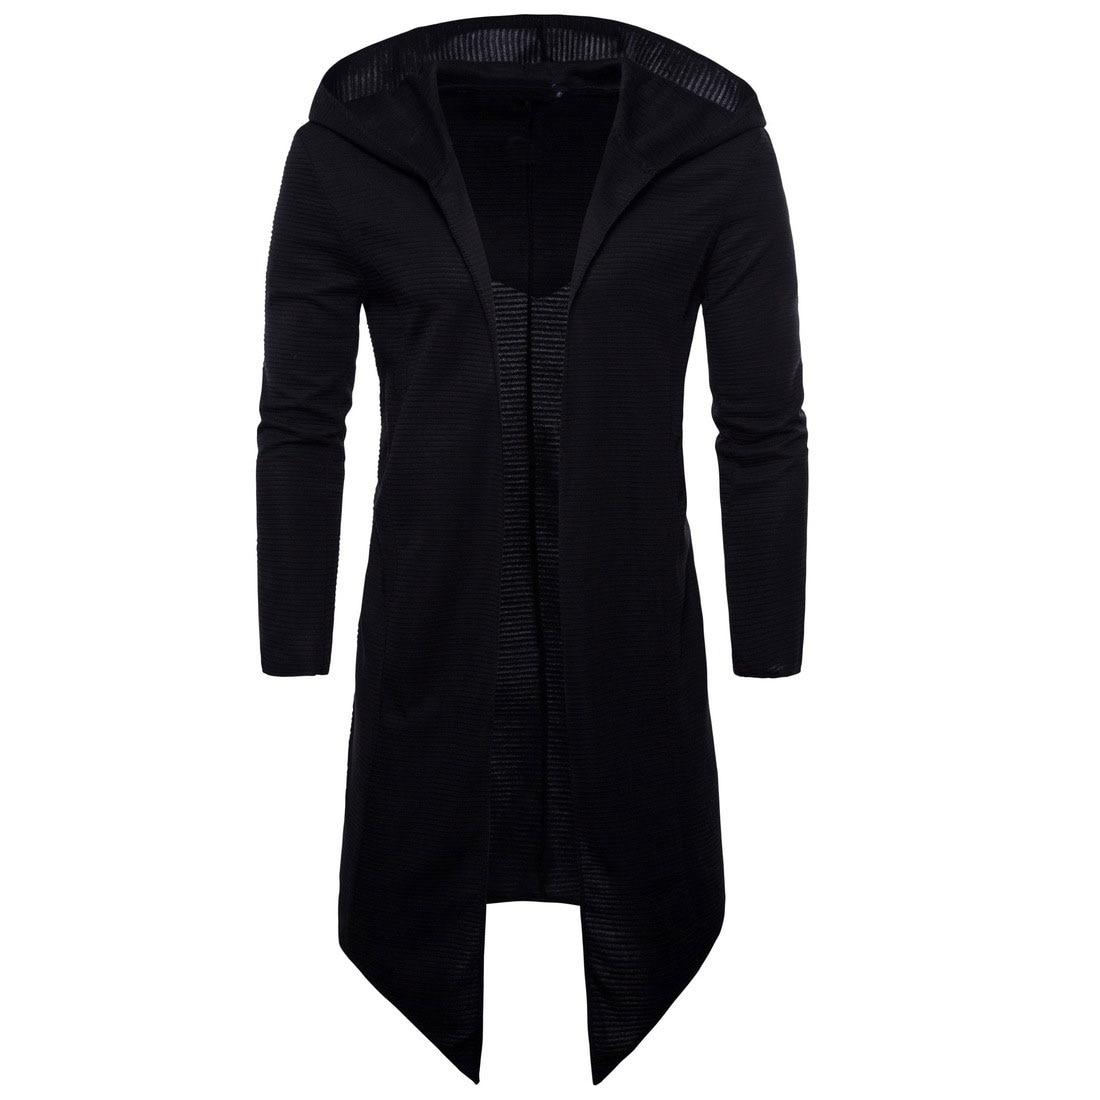 Hombres Trench Coat Primavera de moda Fit Trench hombres abrigo